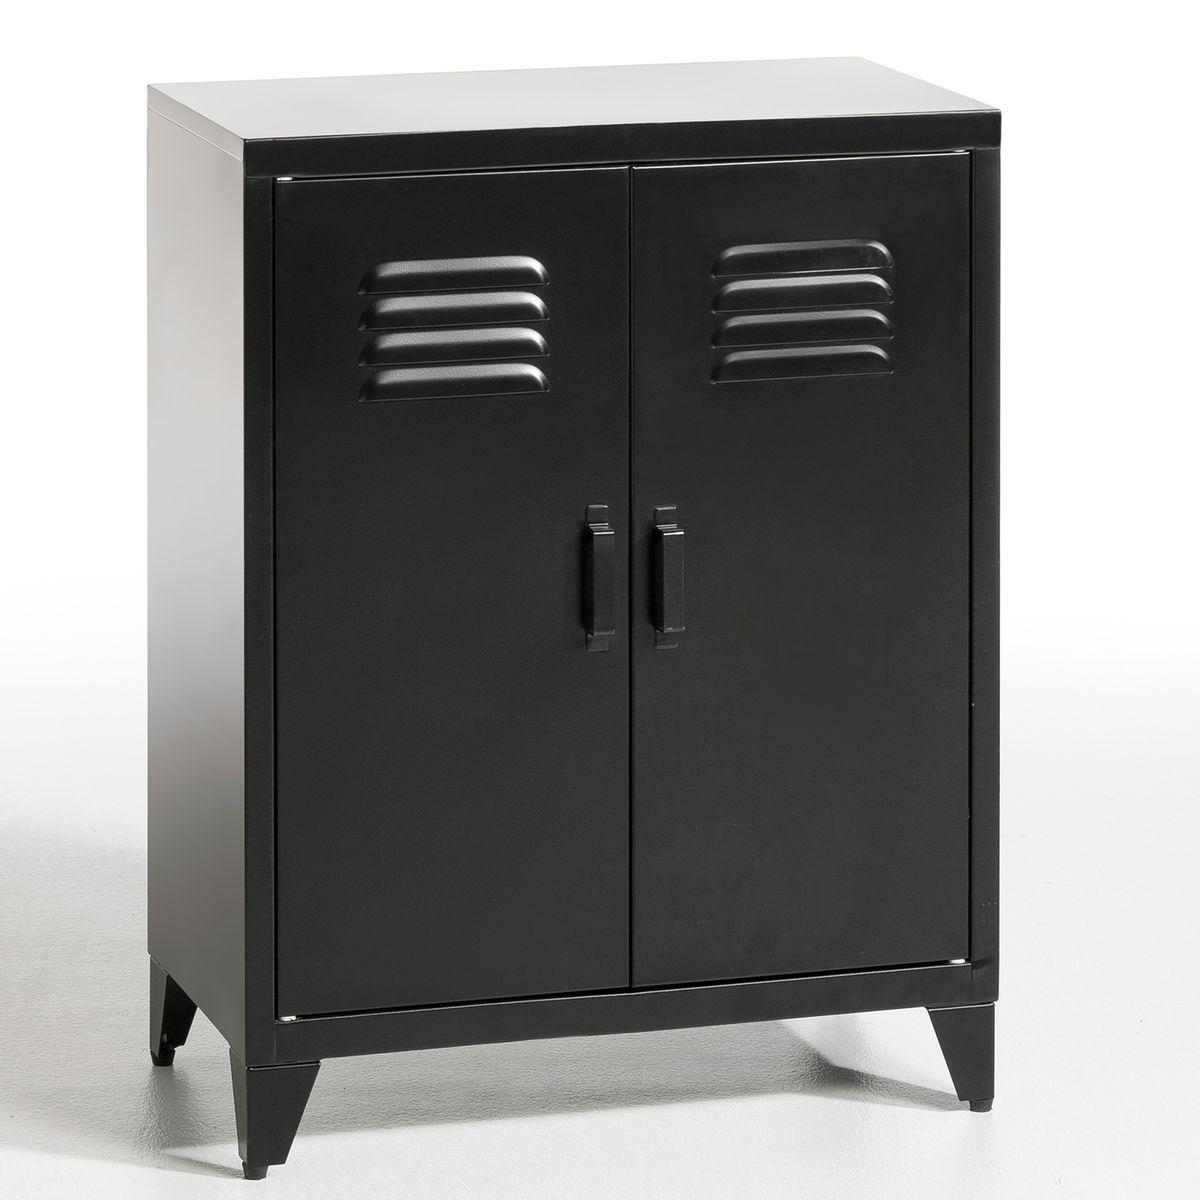 Armoire Locker Armoire Rangement Idee Deco Chambre Armoire